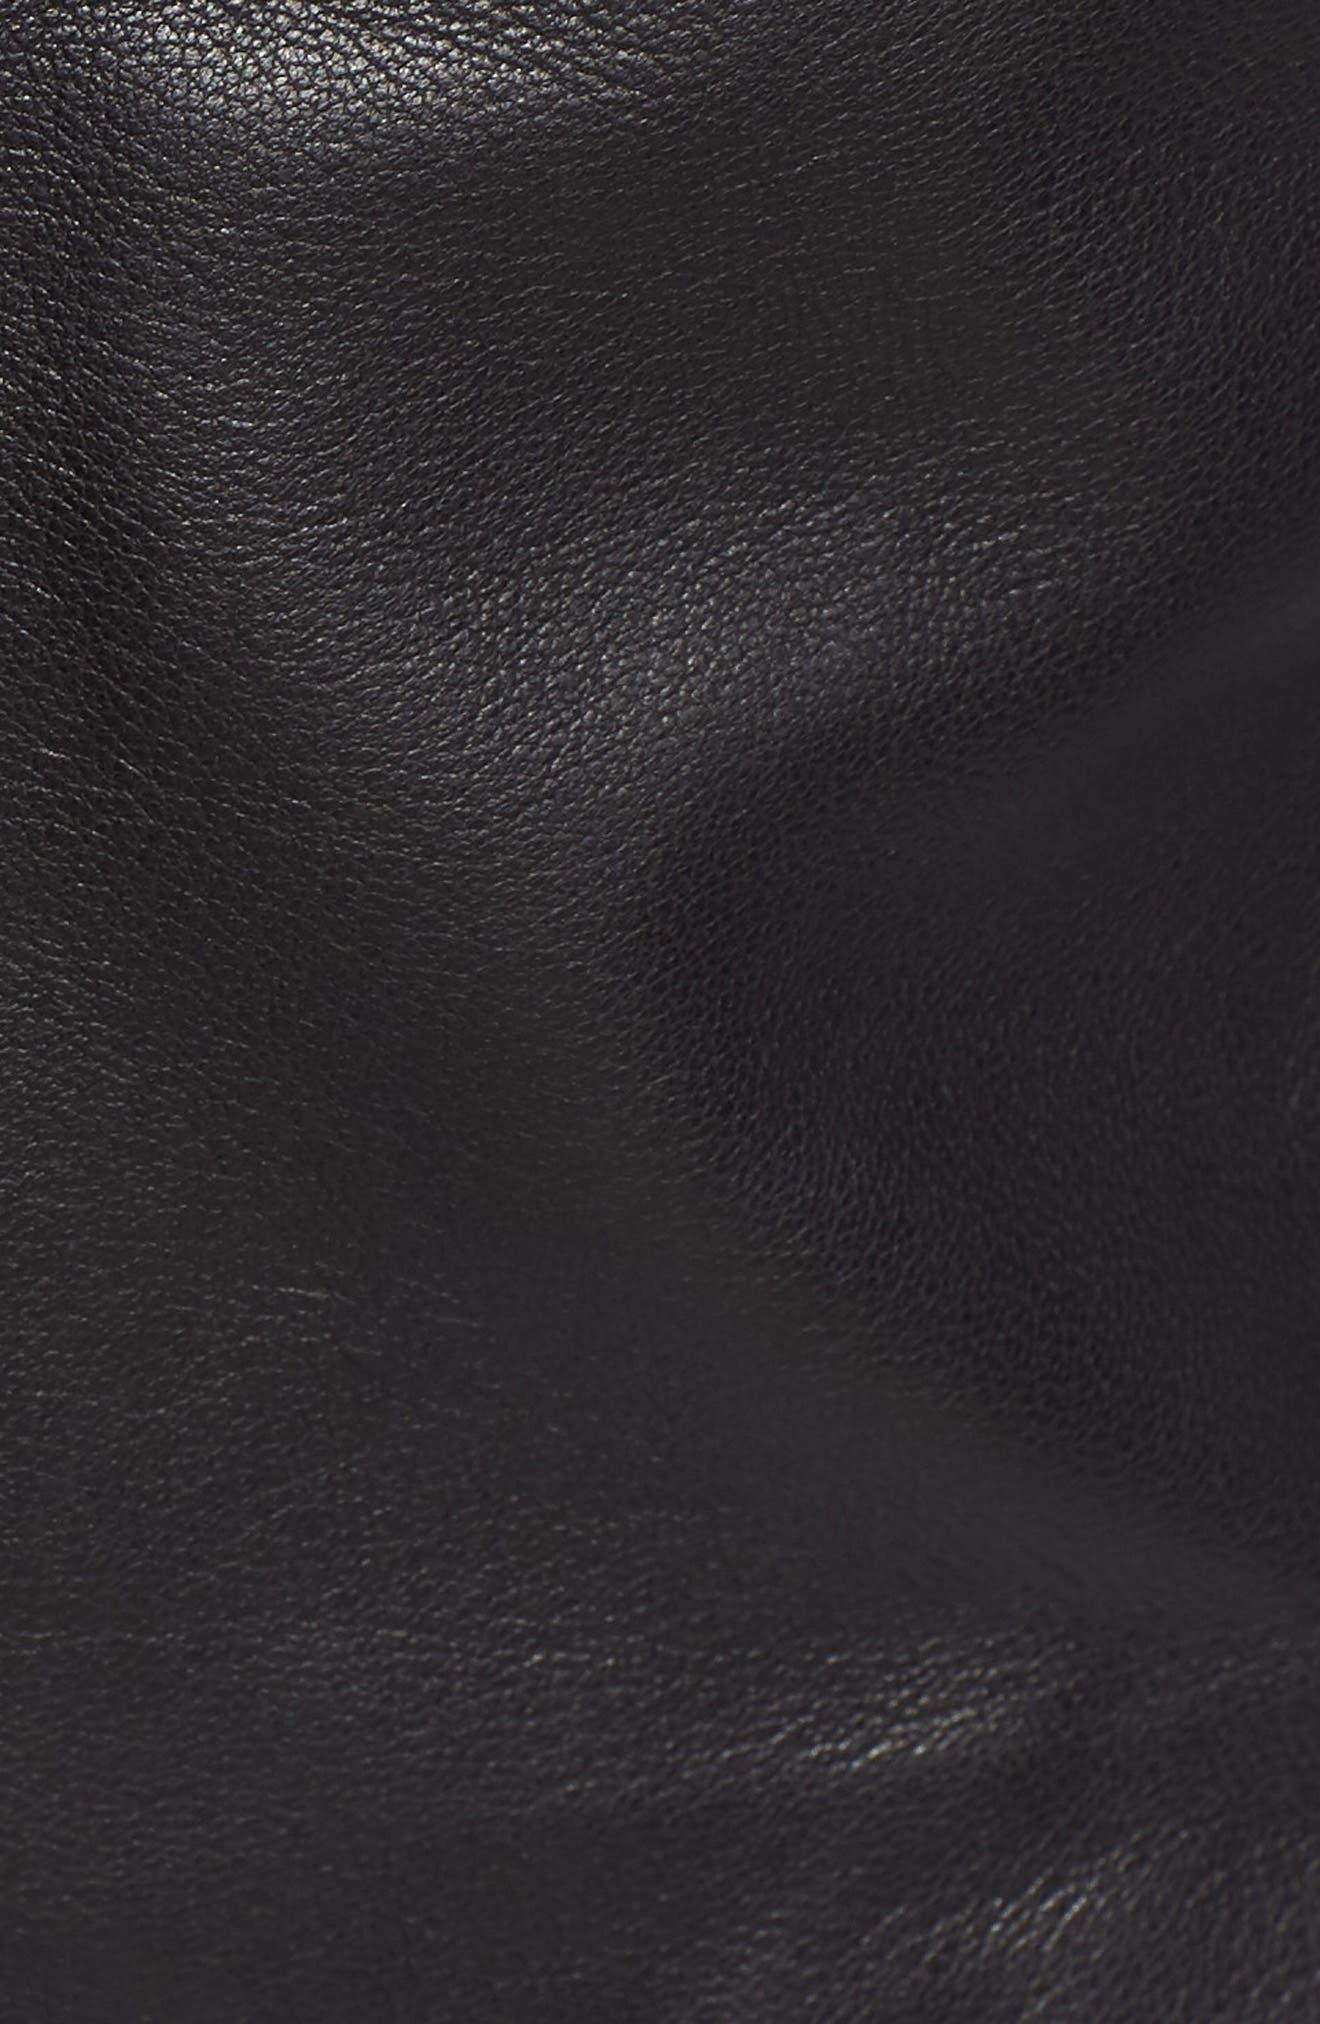 Flutter Sleeve Leather Bustier,                             Alternate thumbnail 6, color,                             BLACK